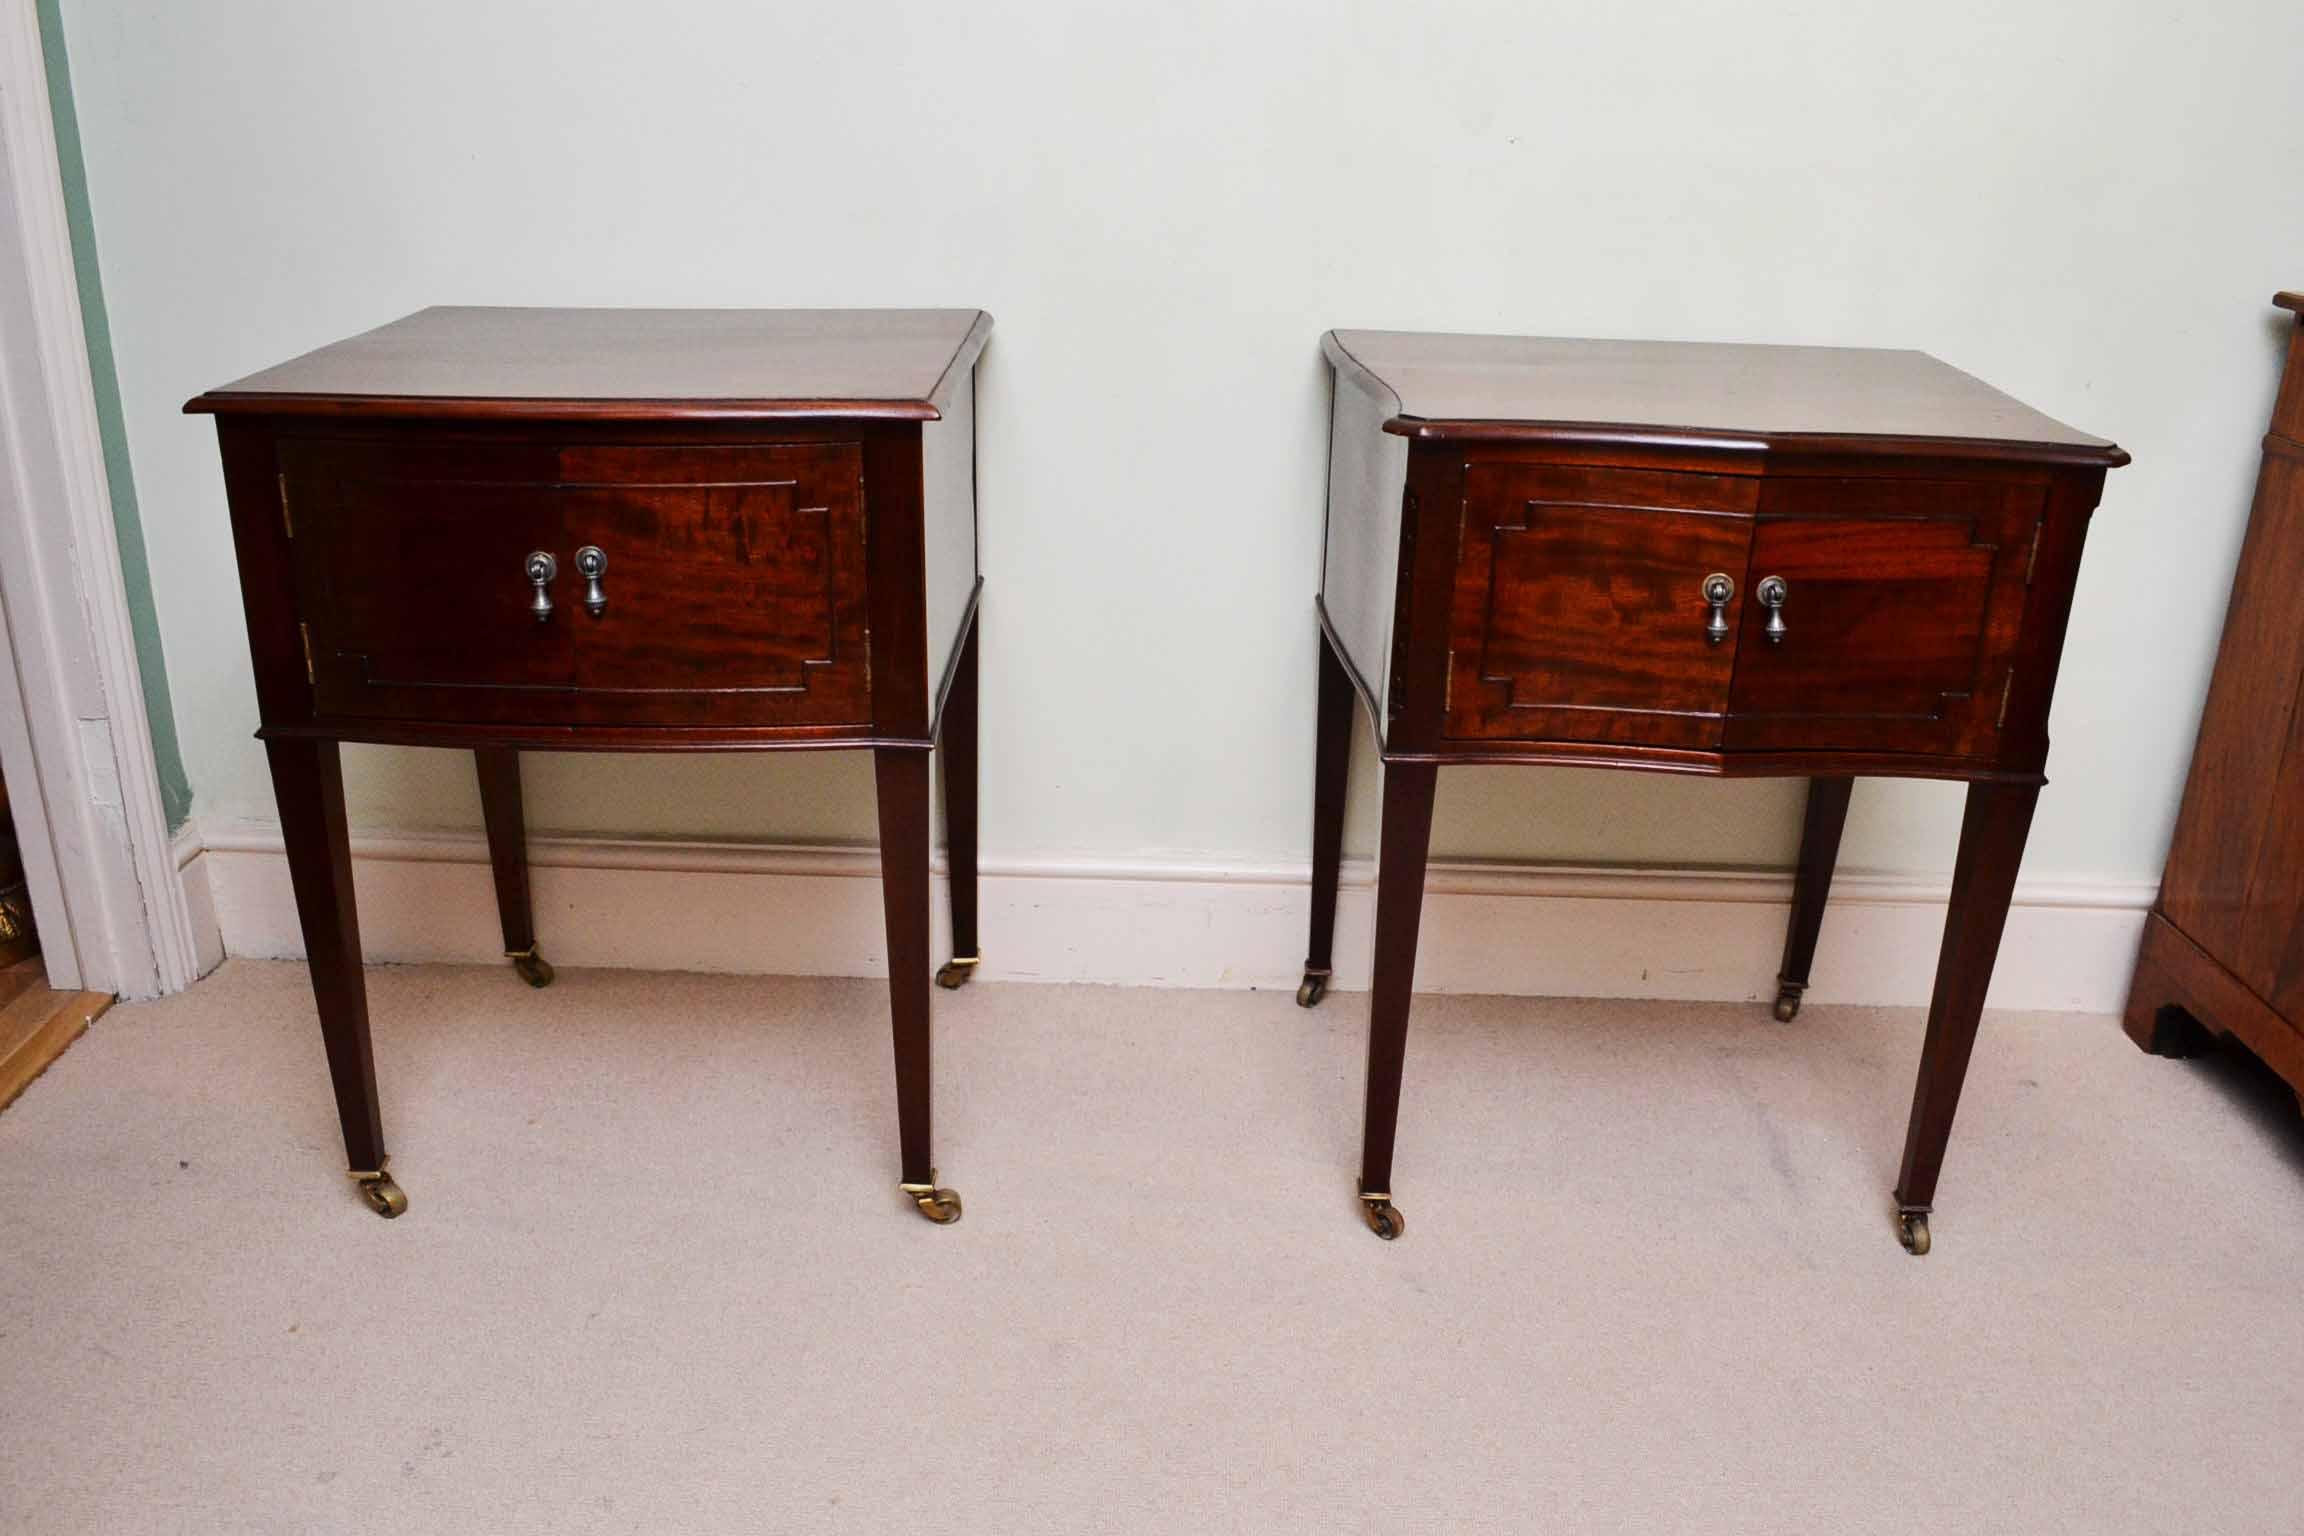 Antique Pair Of Edwardian Bedside Cabinets C 1910